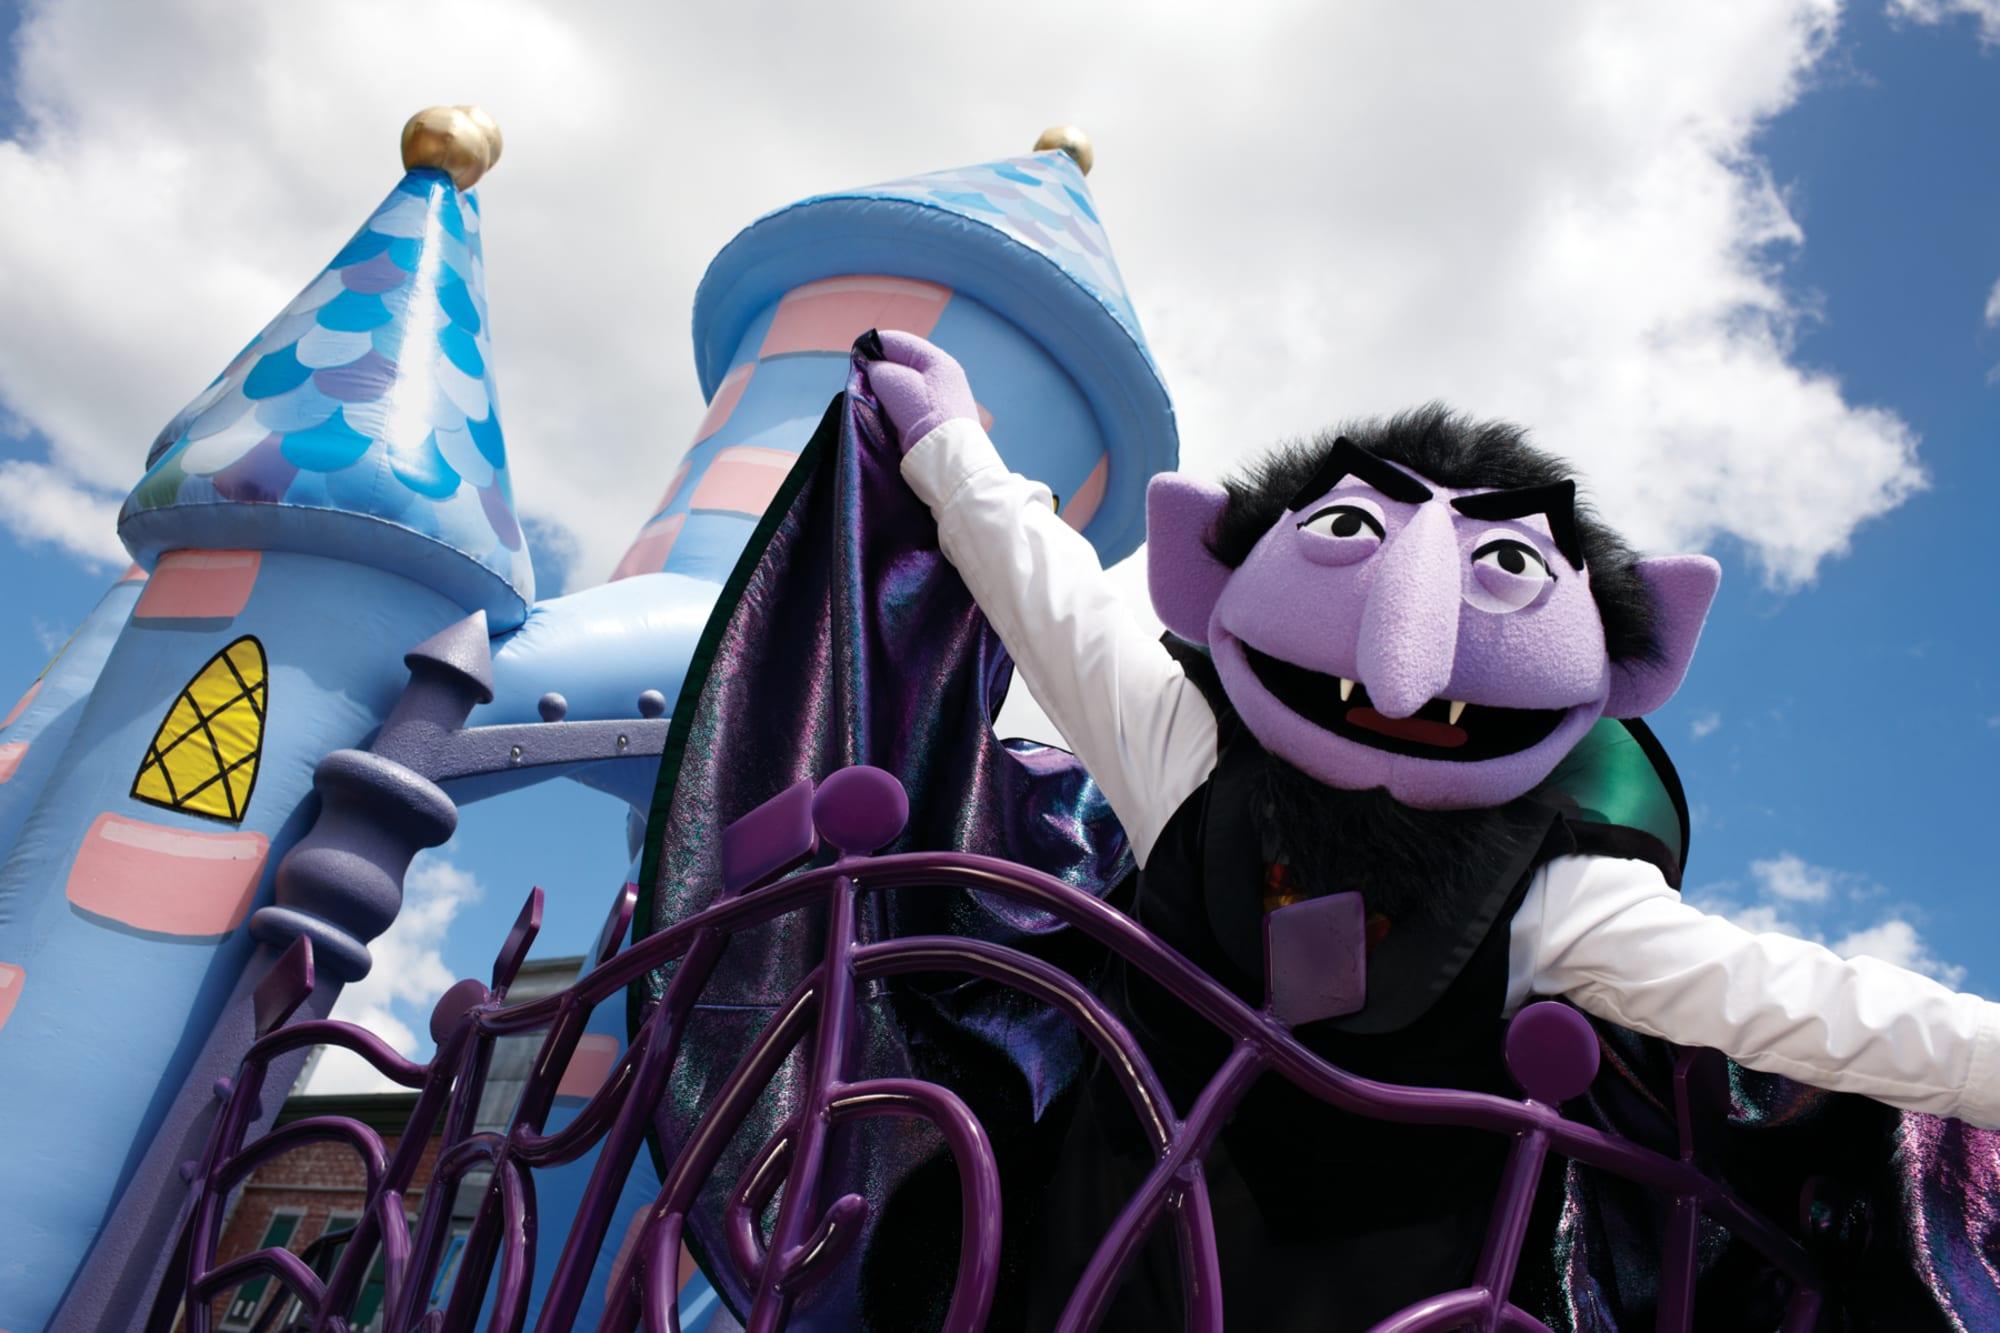 SeaWorld Orlando Spooktacular offers a family friendly Halloween adventure